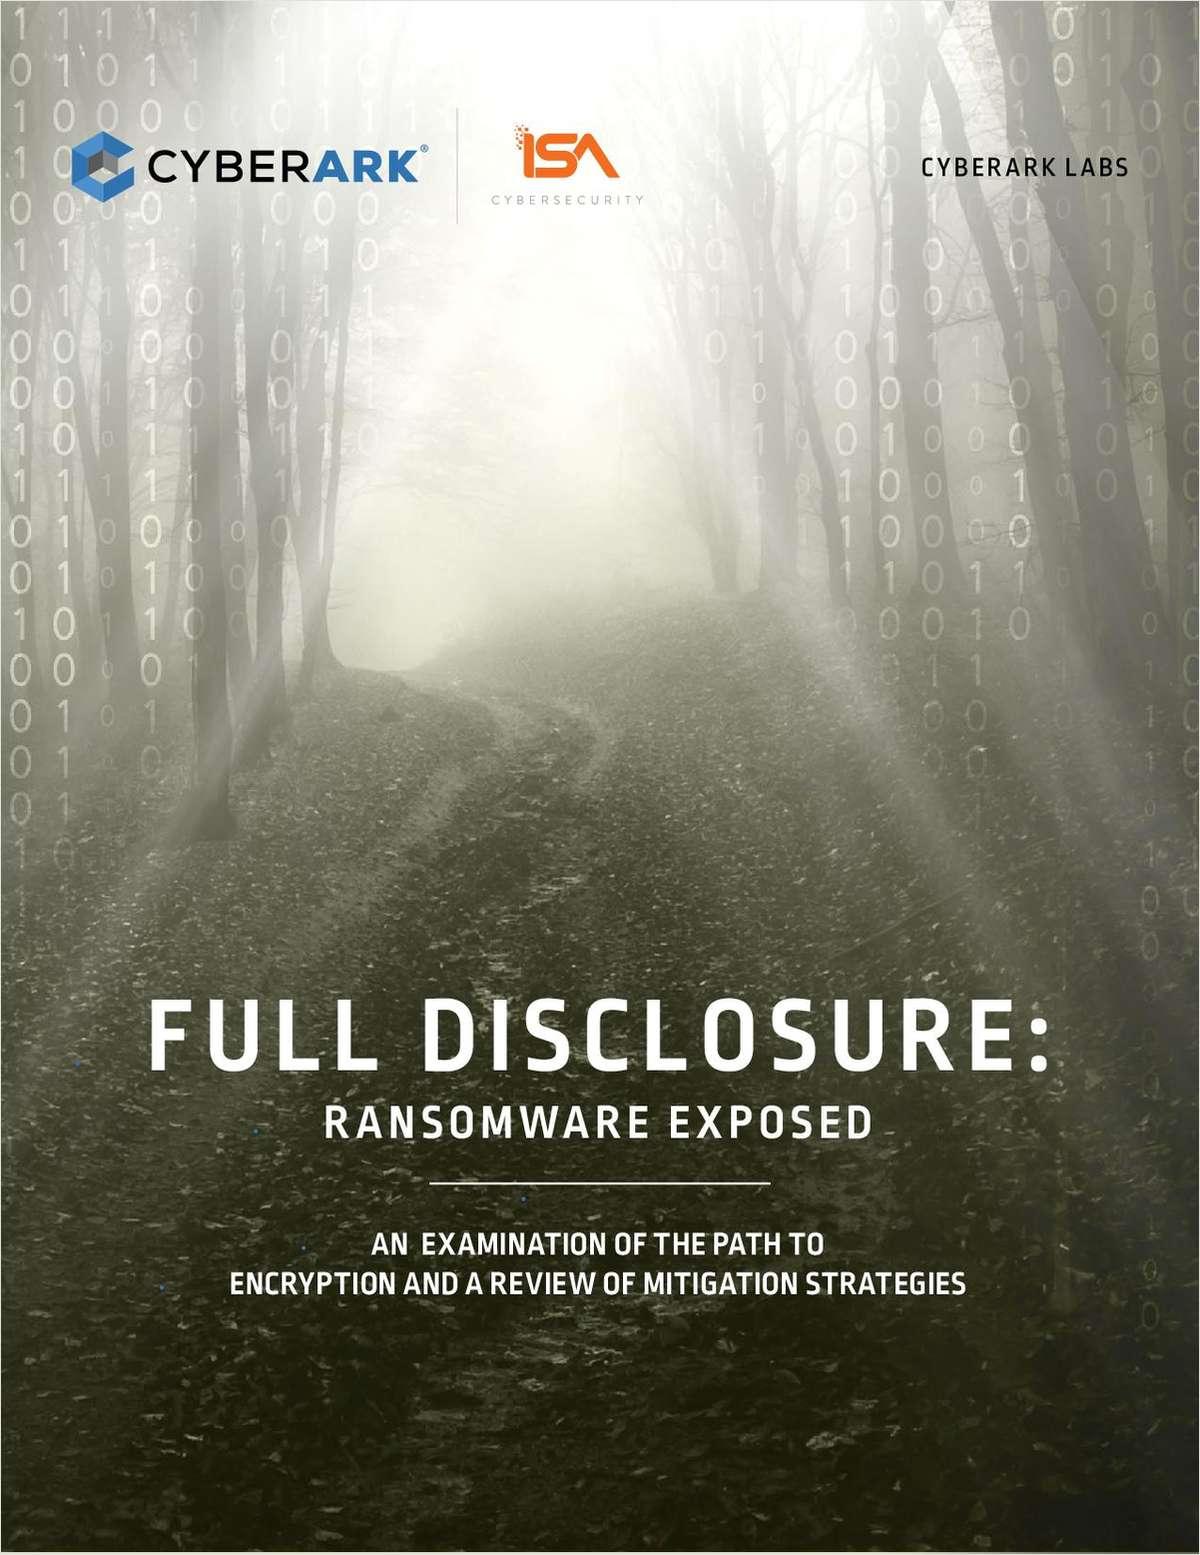 Full Disclosure: Ransomware Exposed